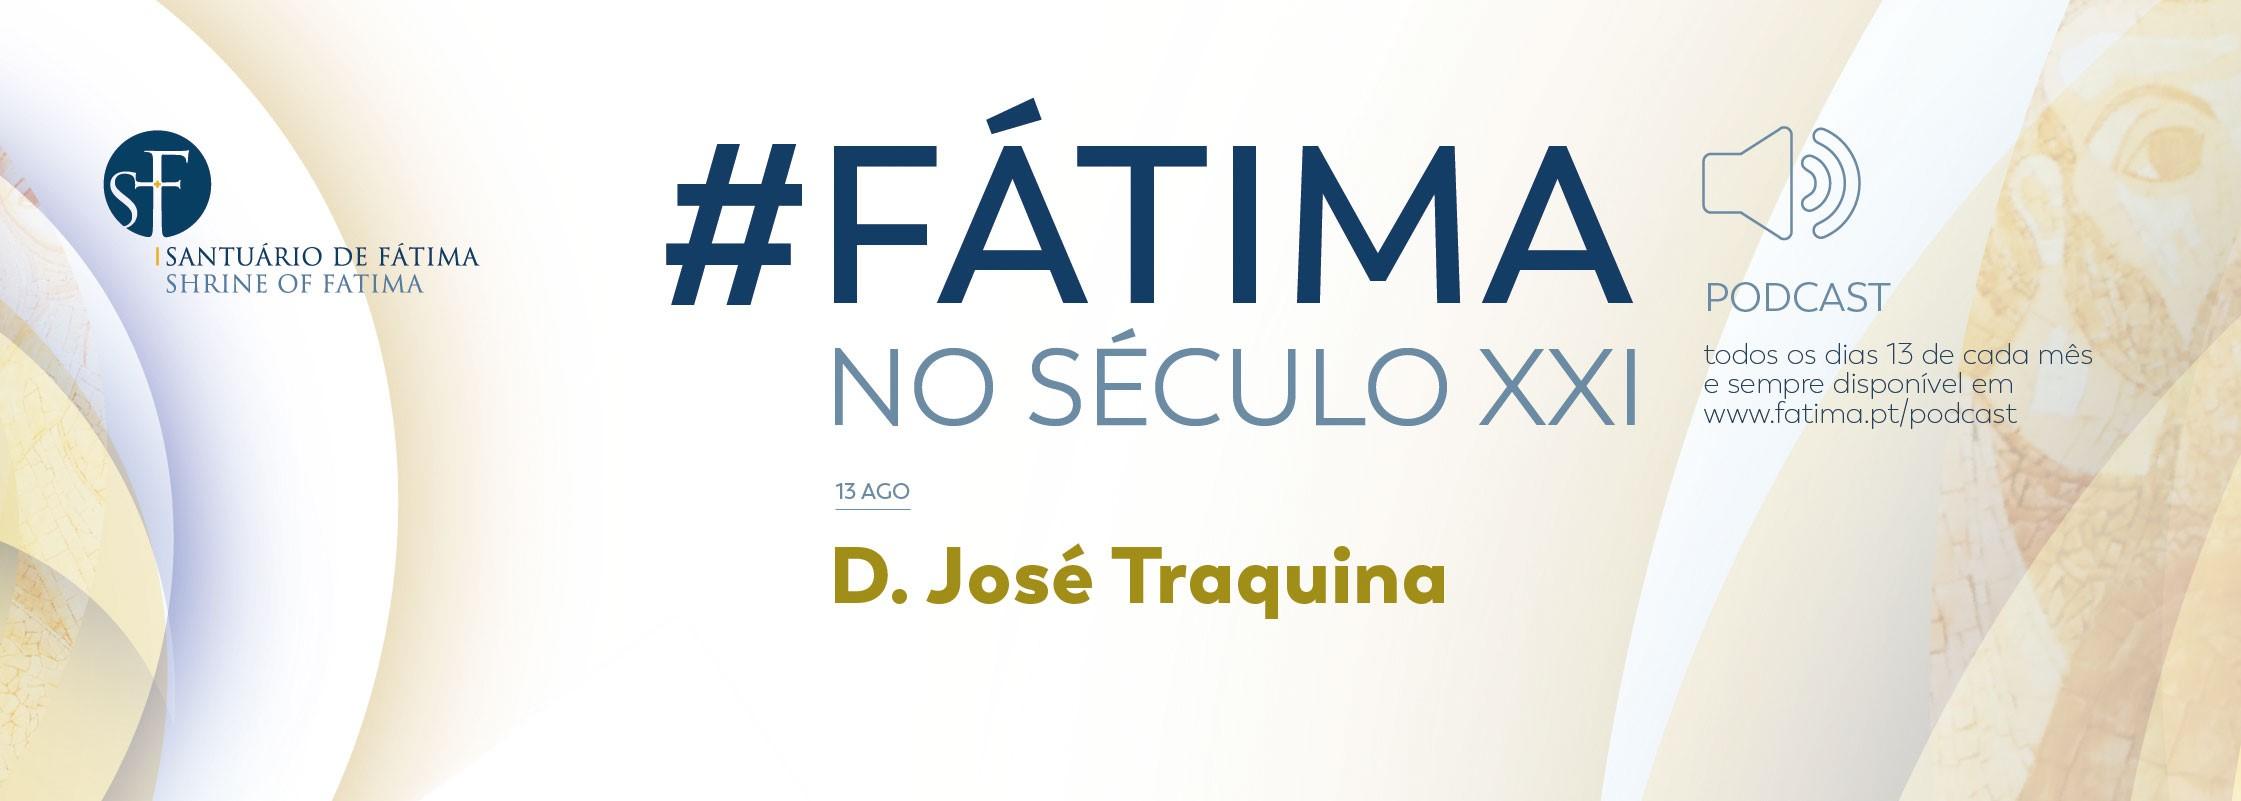 2020-08-13_Podcast_D_Jose_Traquina.jpg